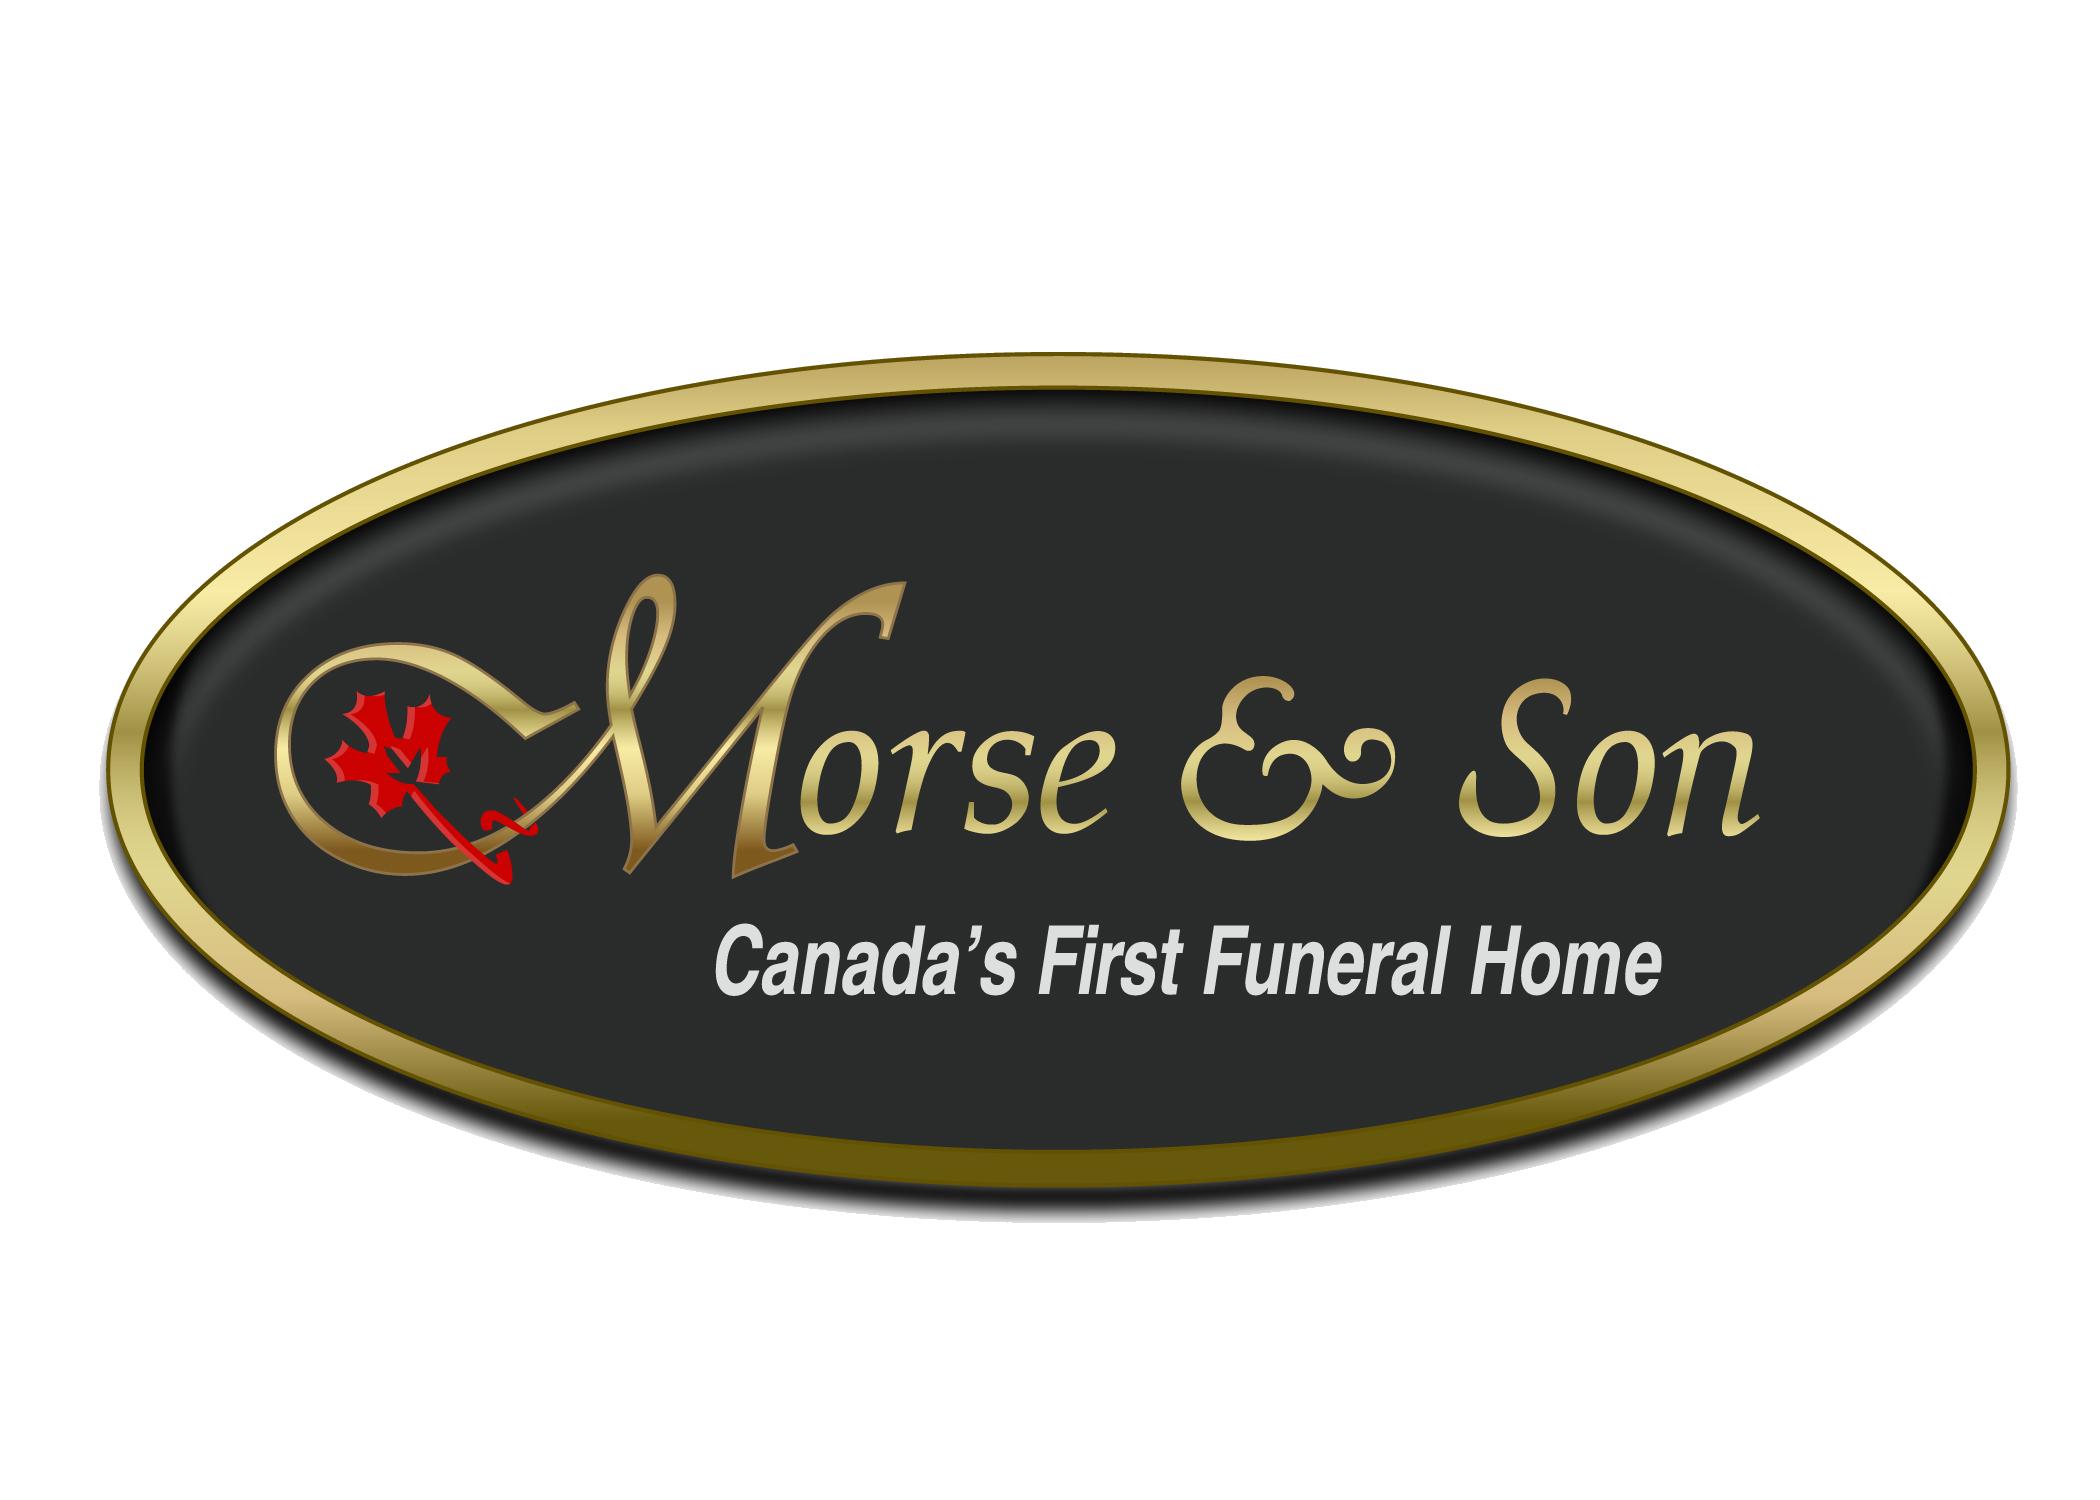 Morse & Son Funeral Home